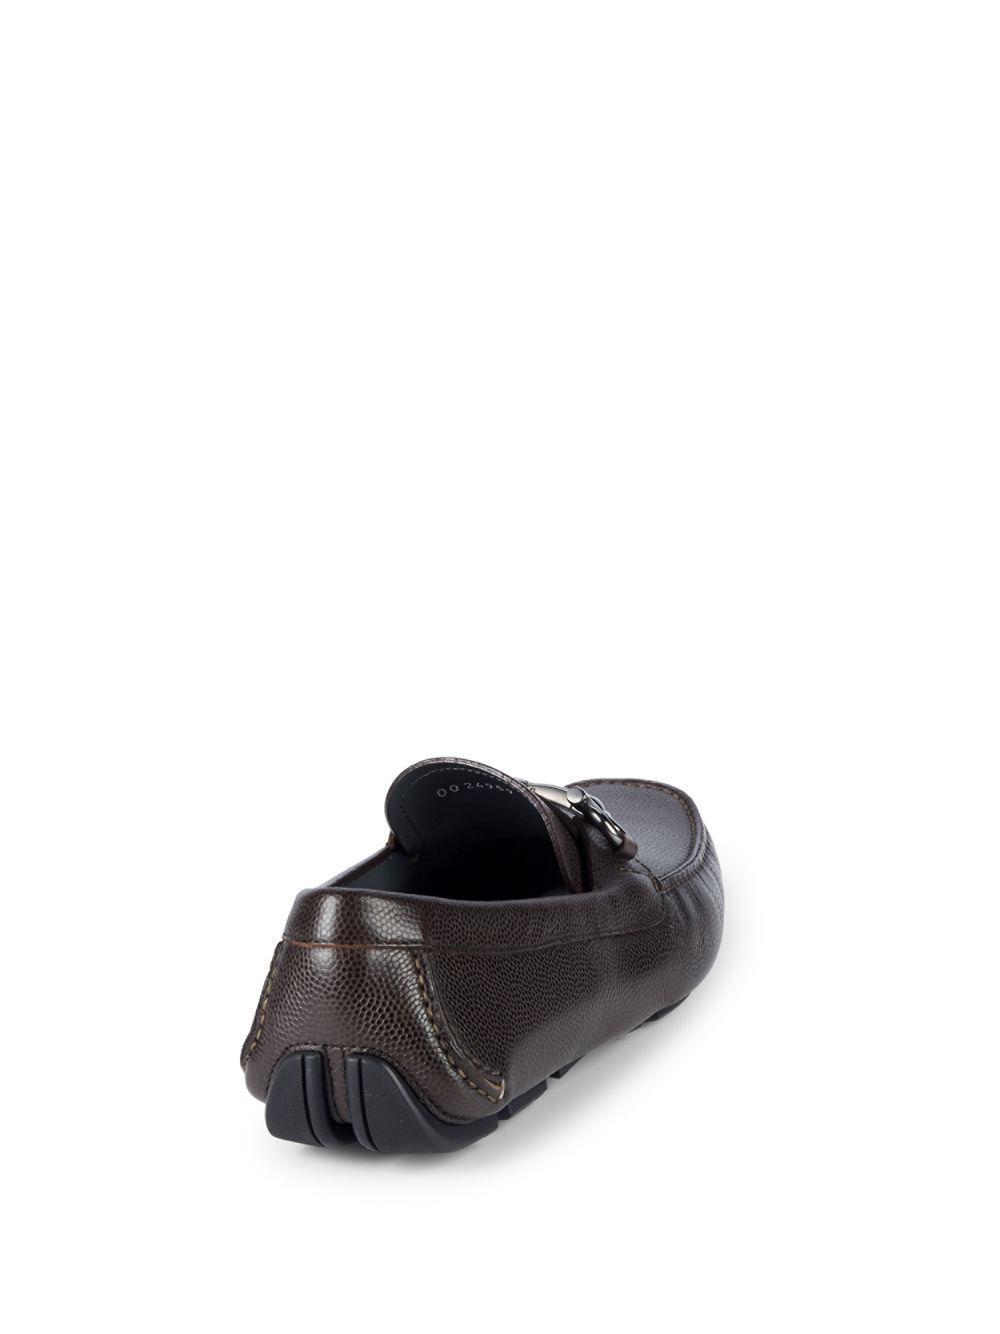 7cf2d6c4031 Lyst - Ferragamo New Parigi Leather Drivers in Brown for Men